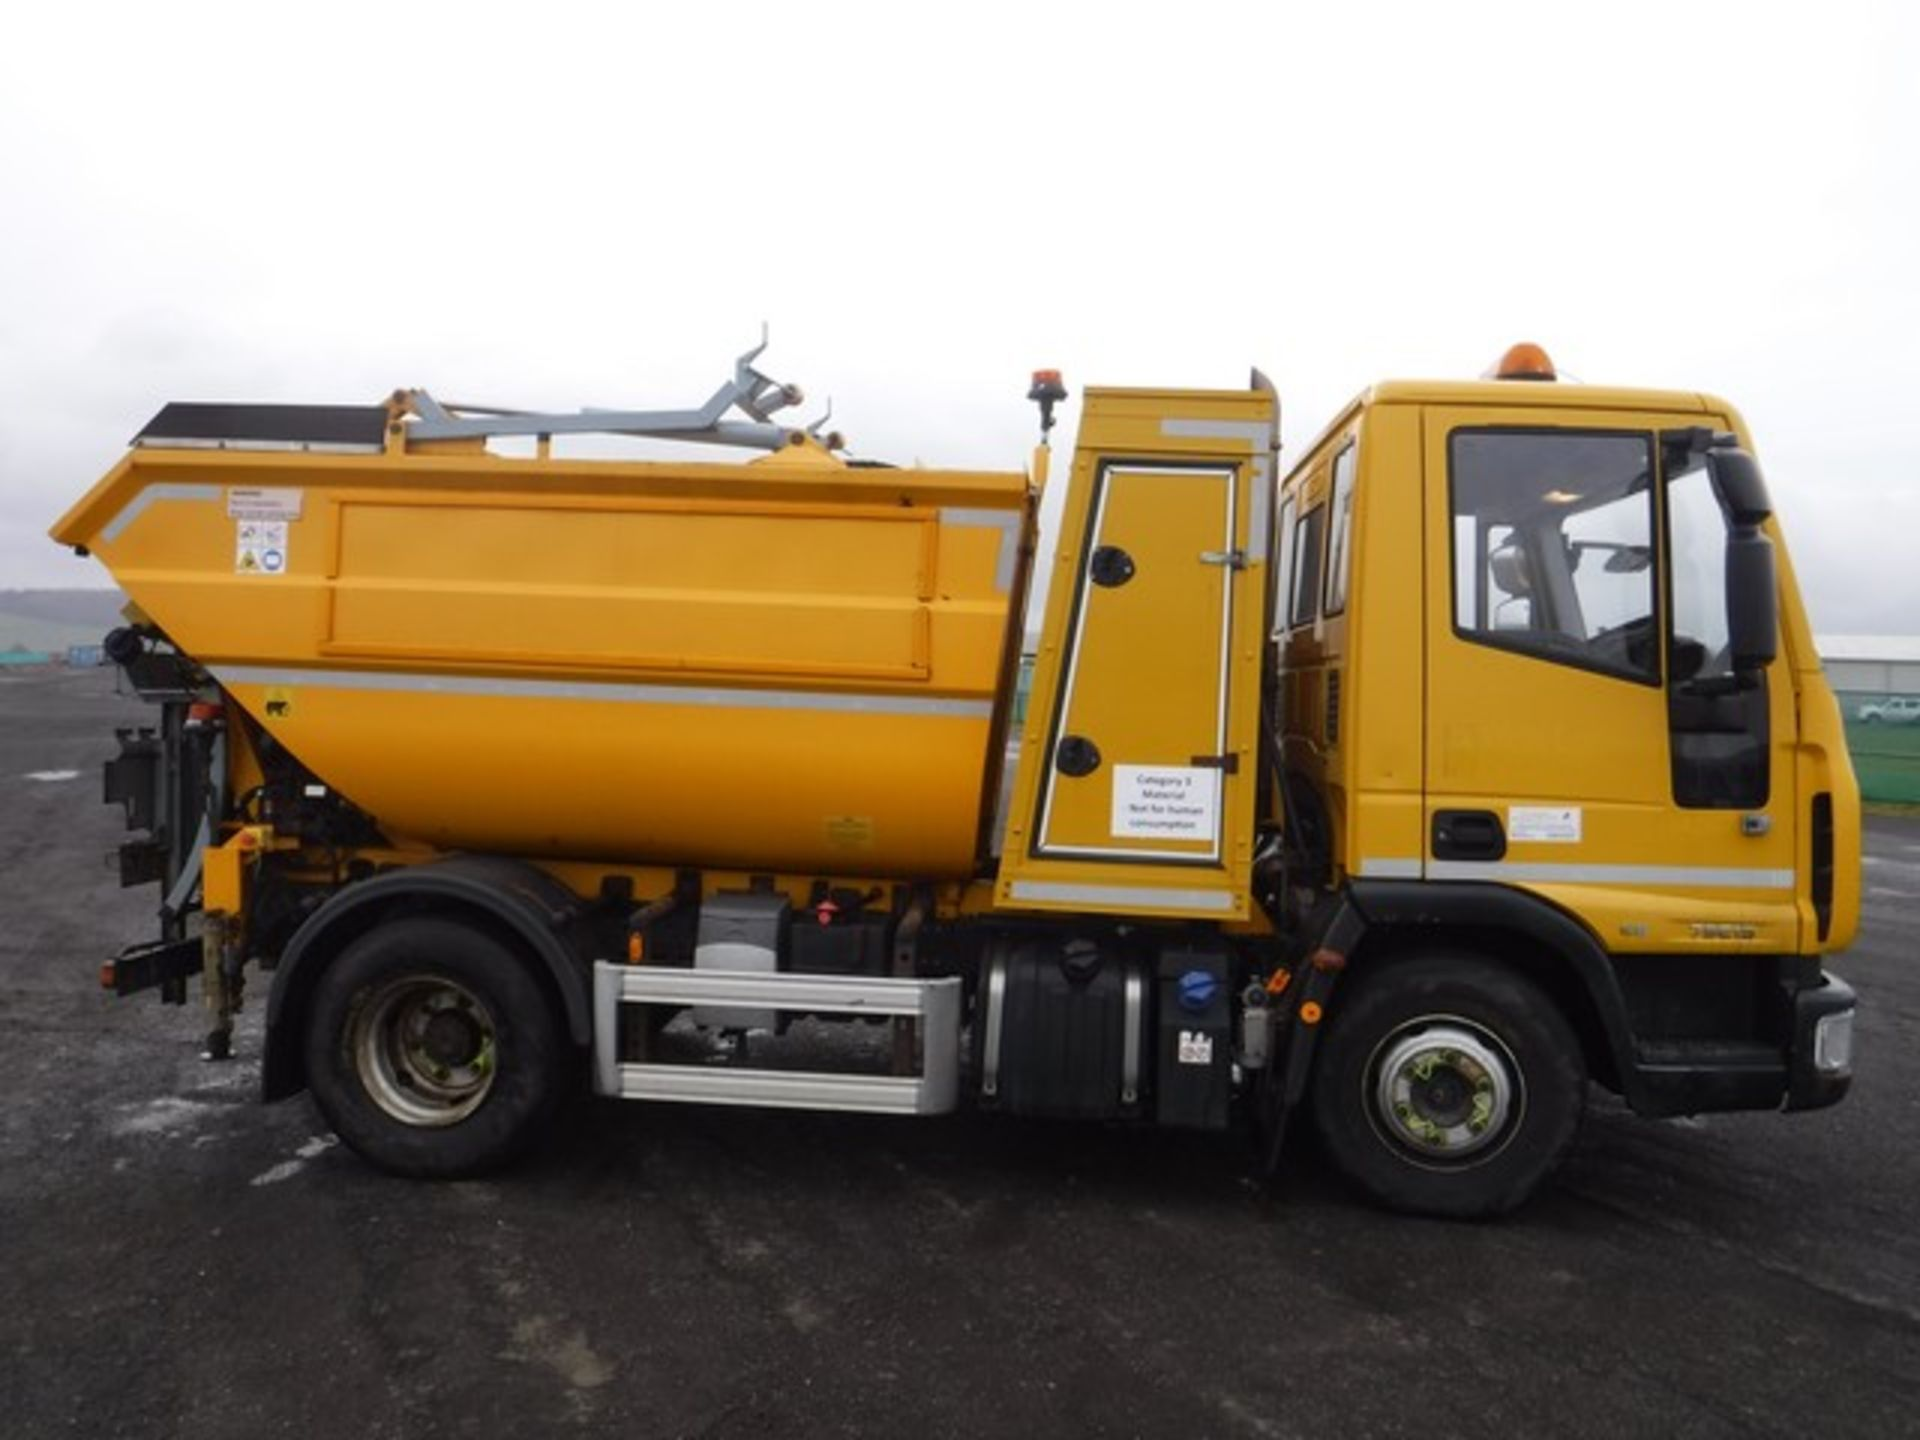 Lot 1718 - IVECO EUROCARGO 75E19S S-A - 4485cc